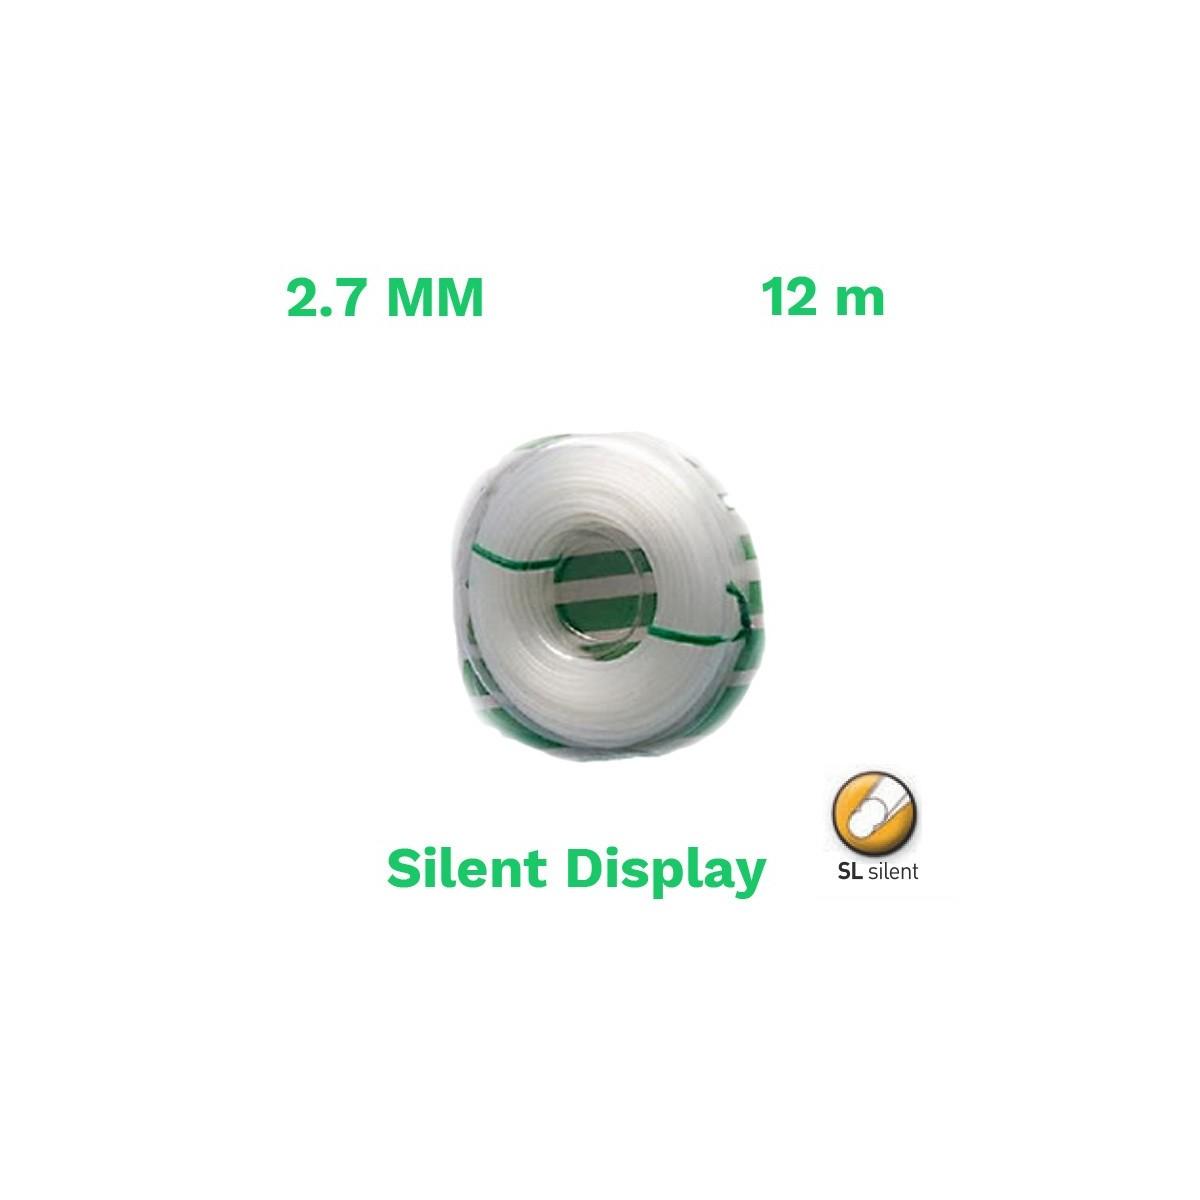 Echo hilo nylon silent display 2.7mm 12 m